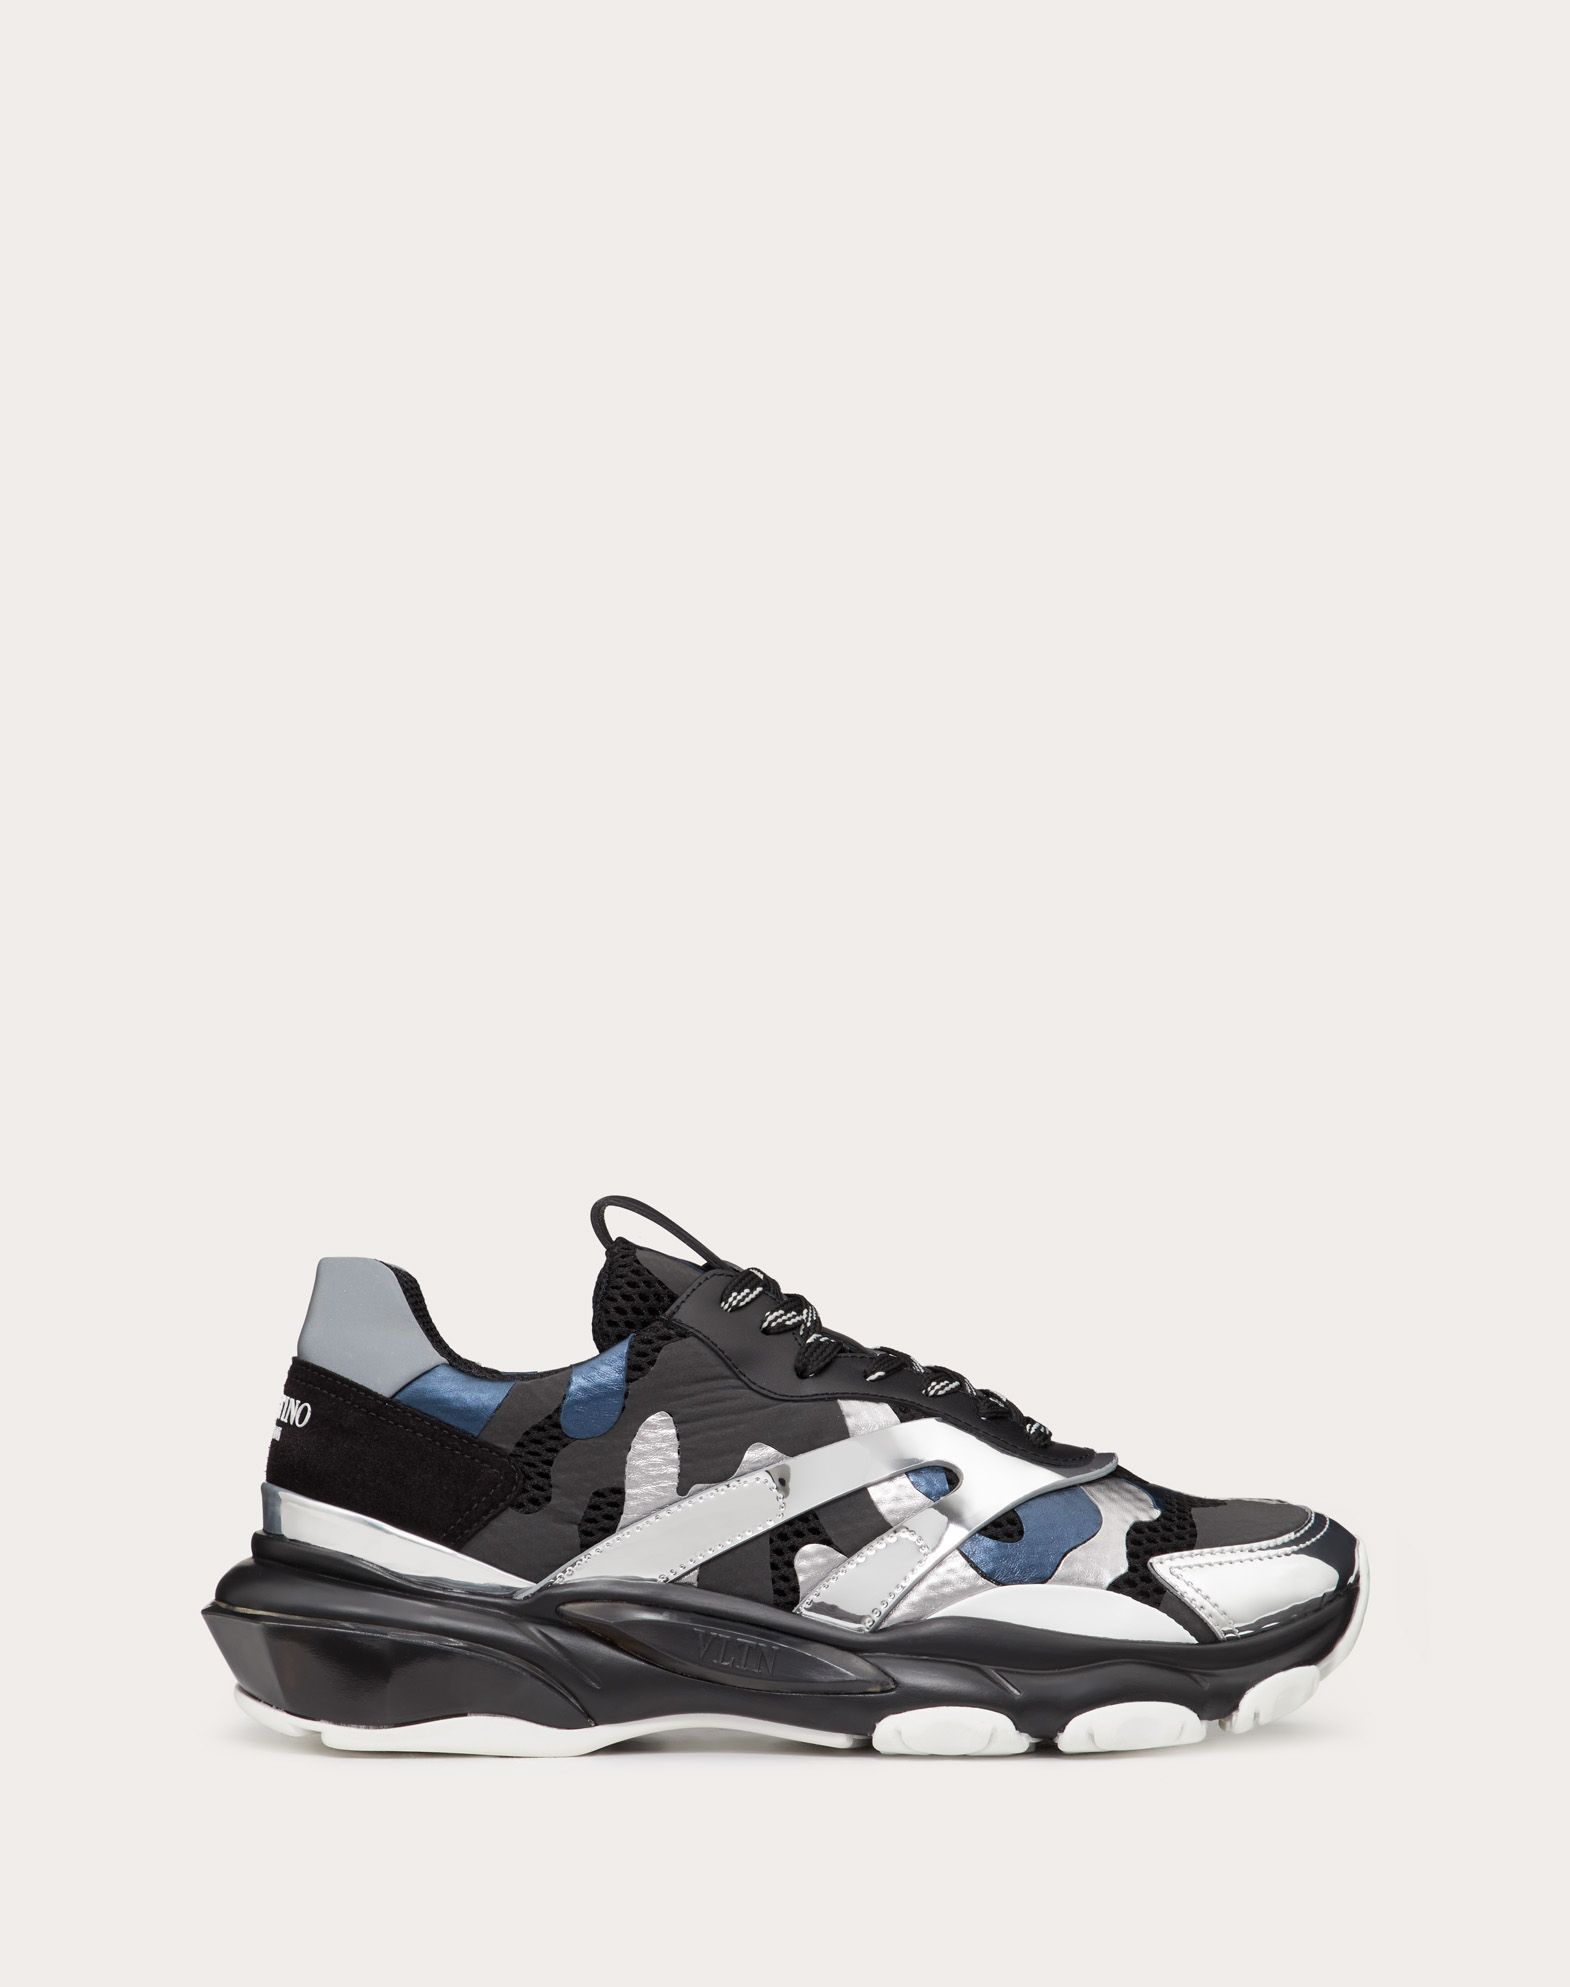 Sneakers Bounce Camouflage aus laminiertem Leder in Spiegel-Optik